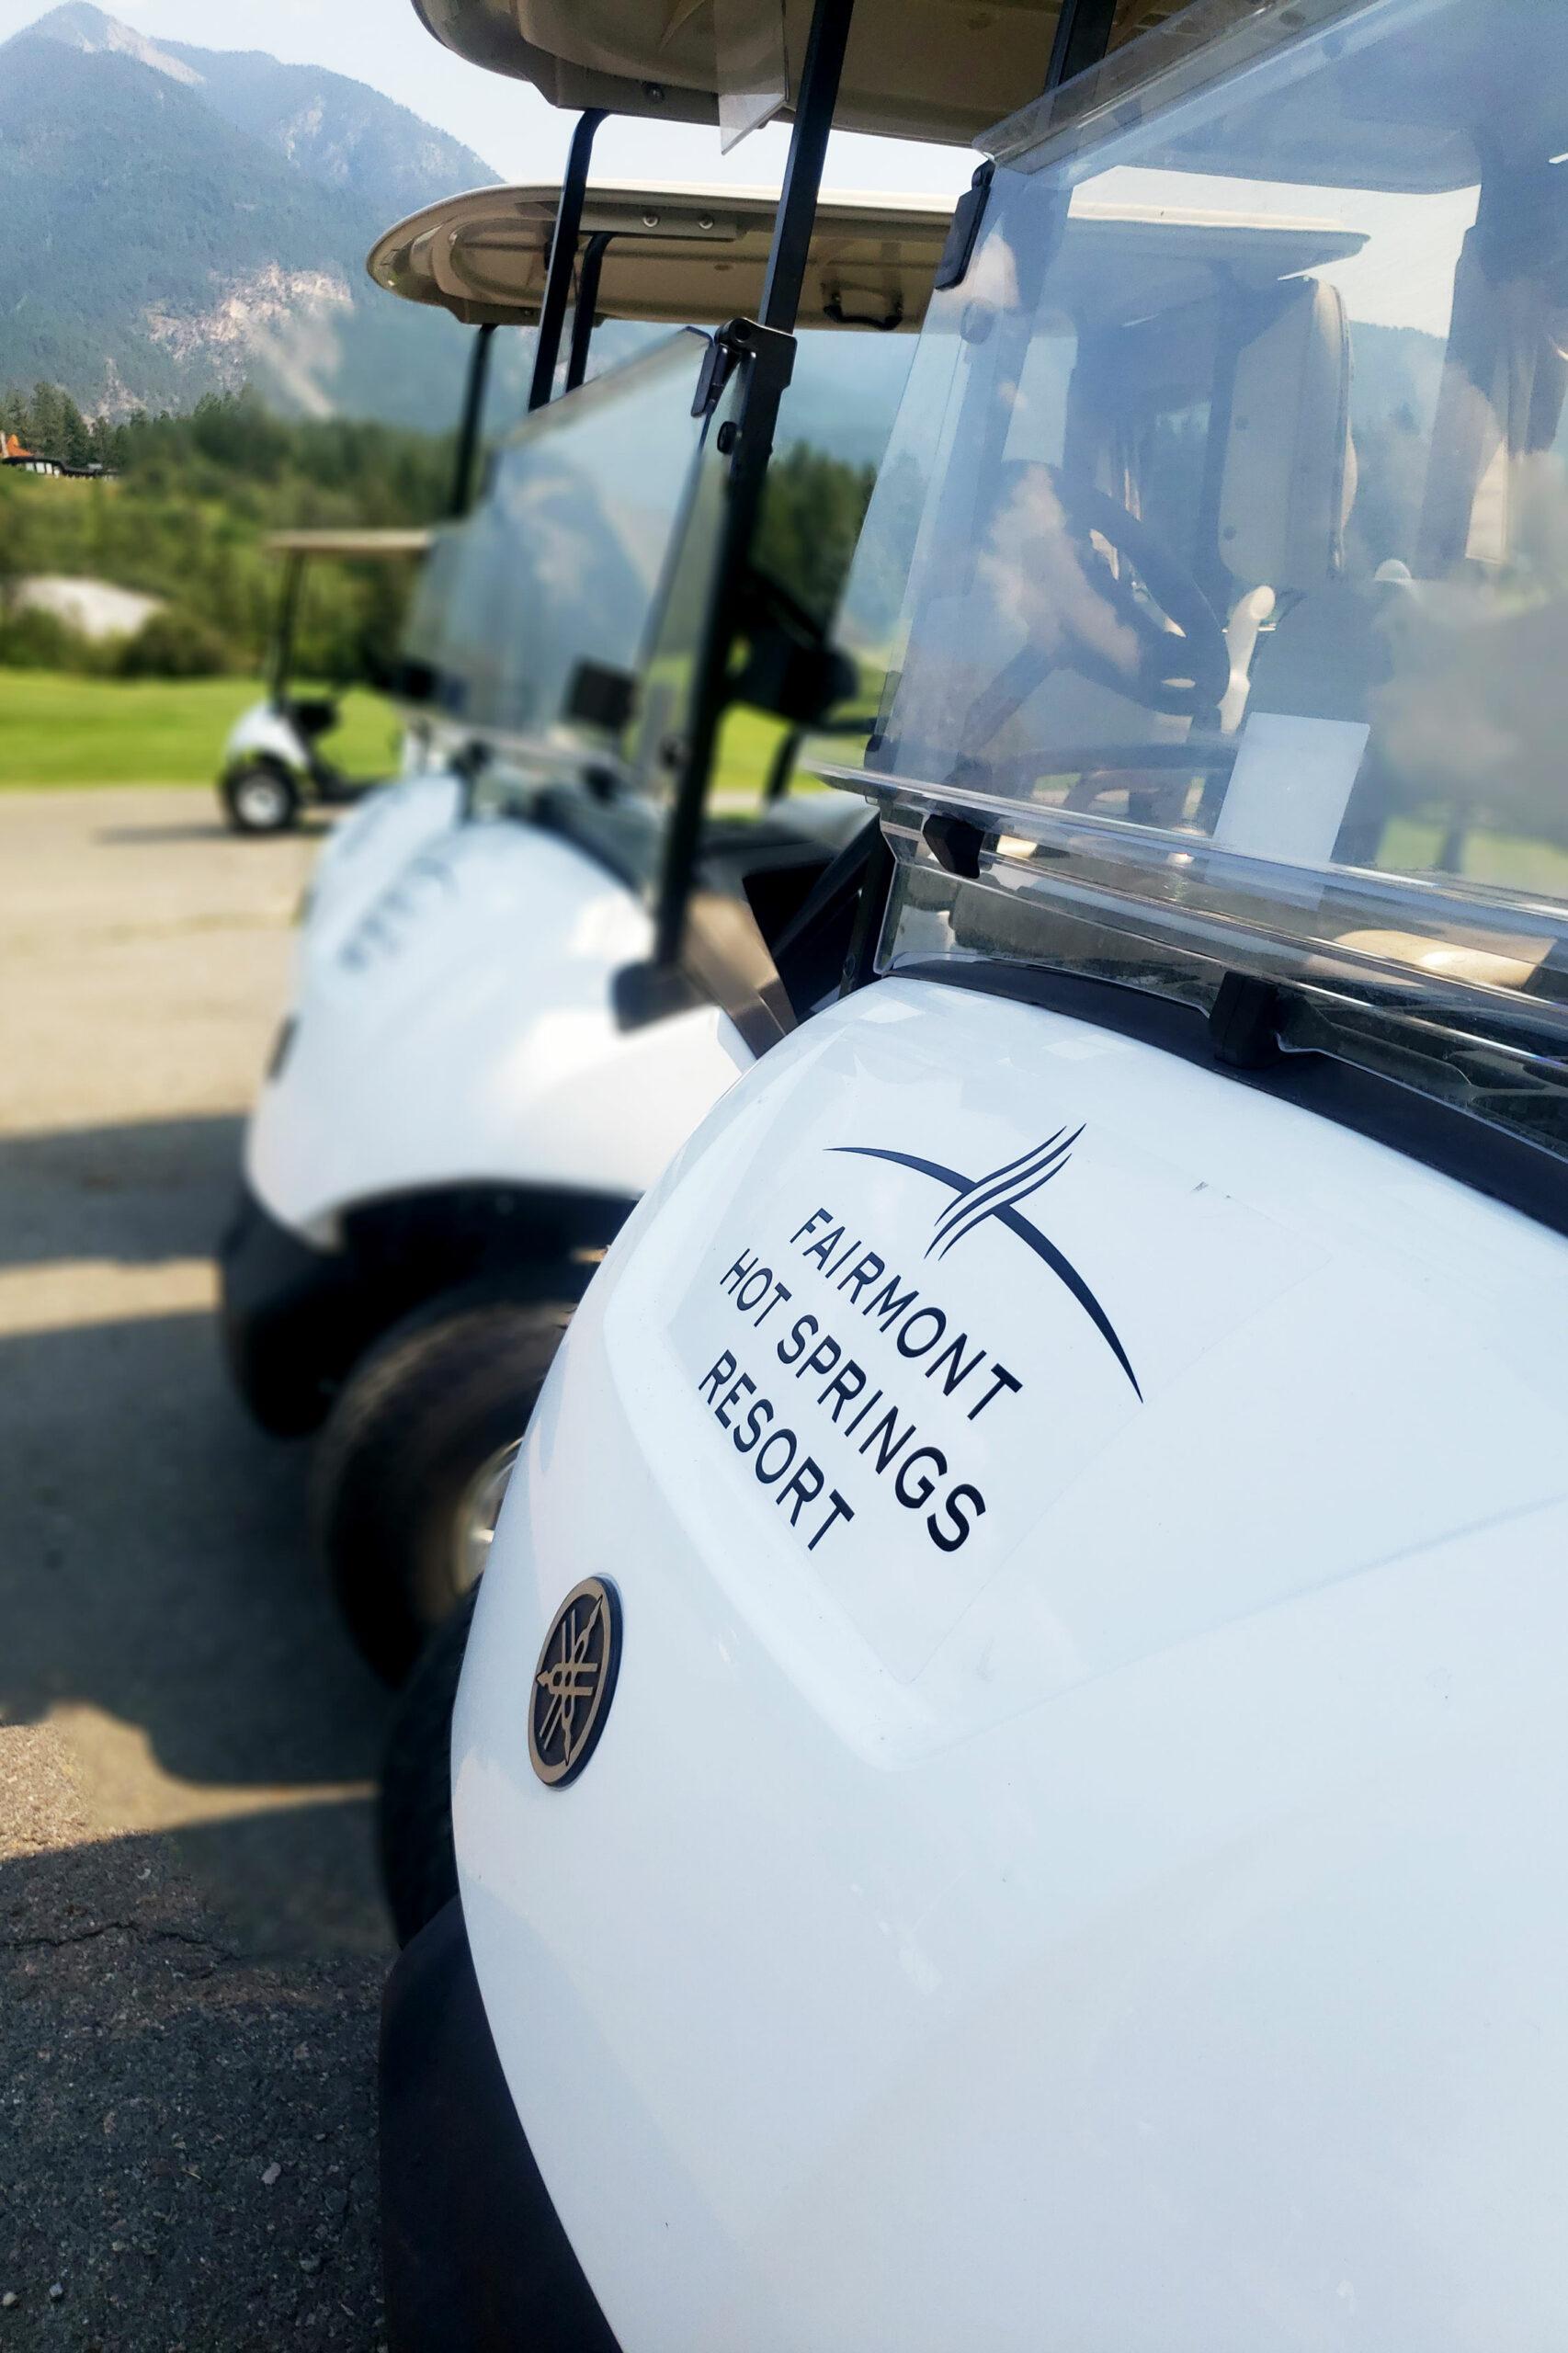 Golf Carts at Fairmont Hot Springs Resort